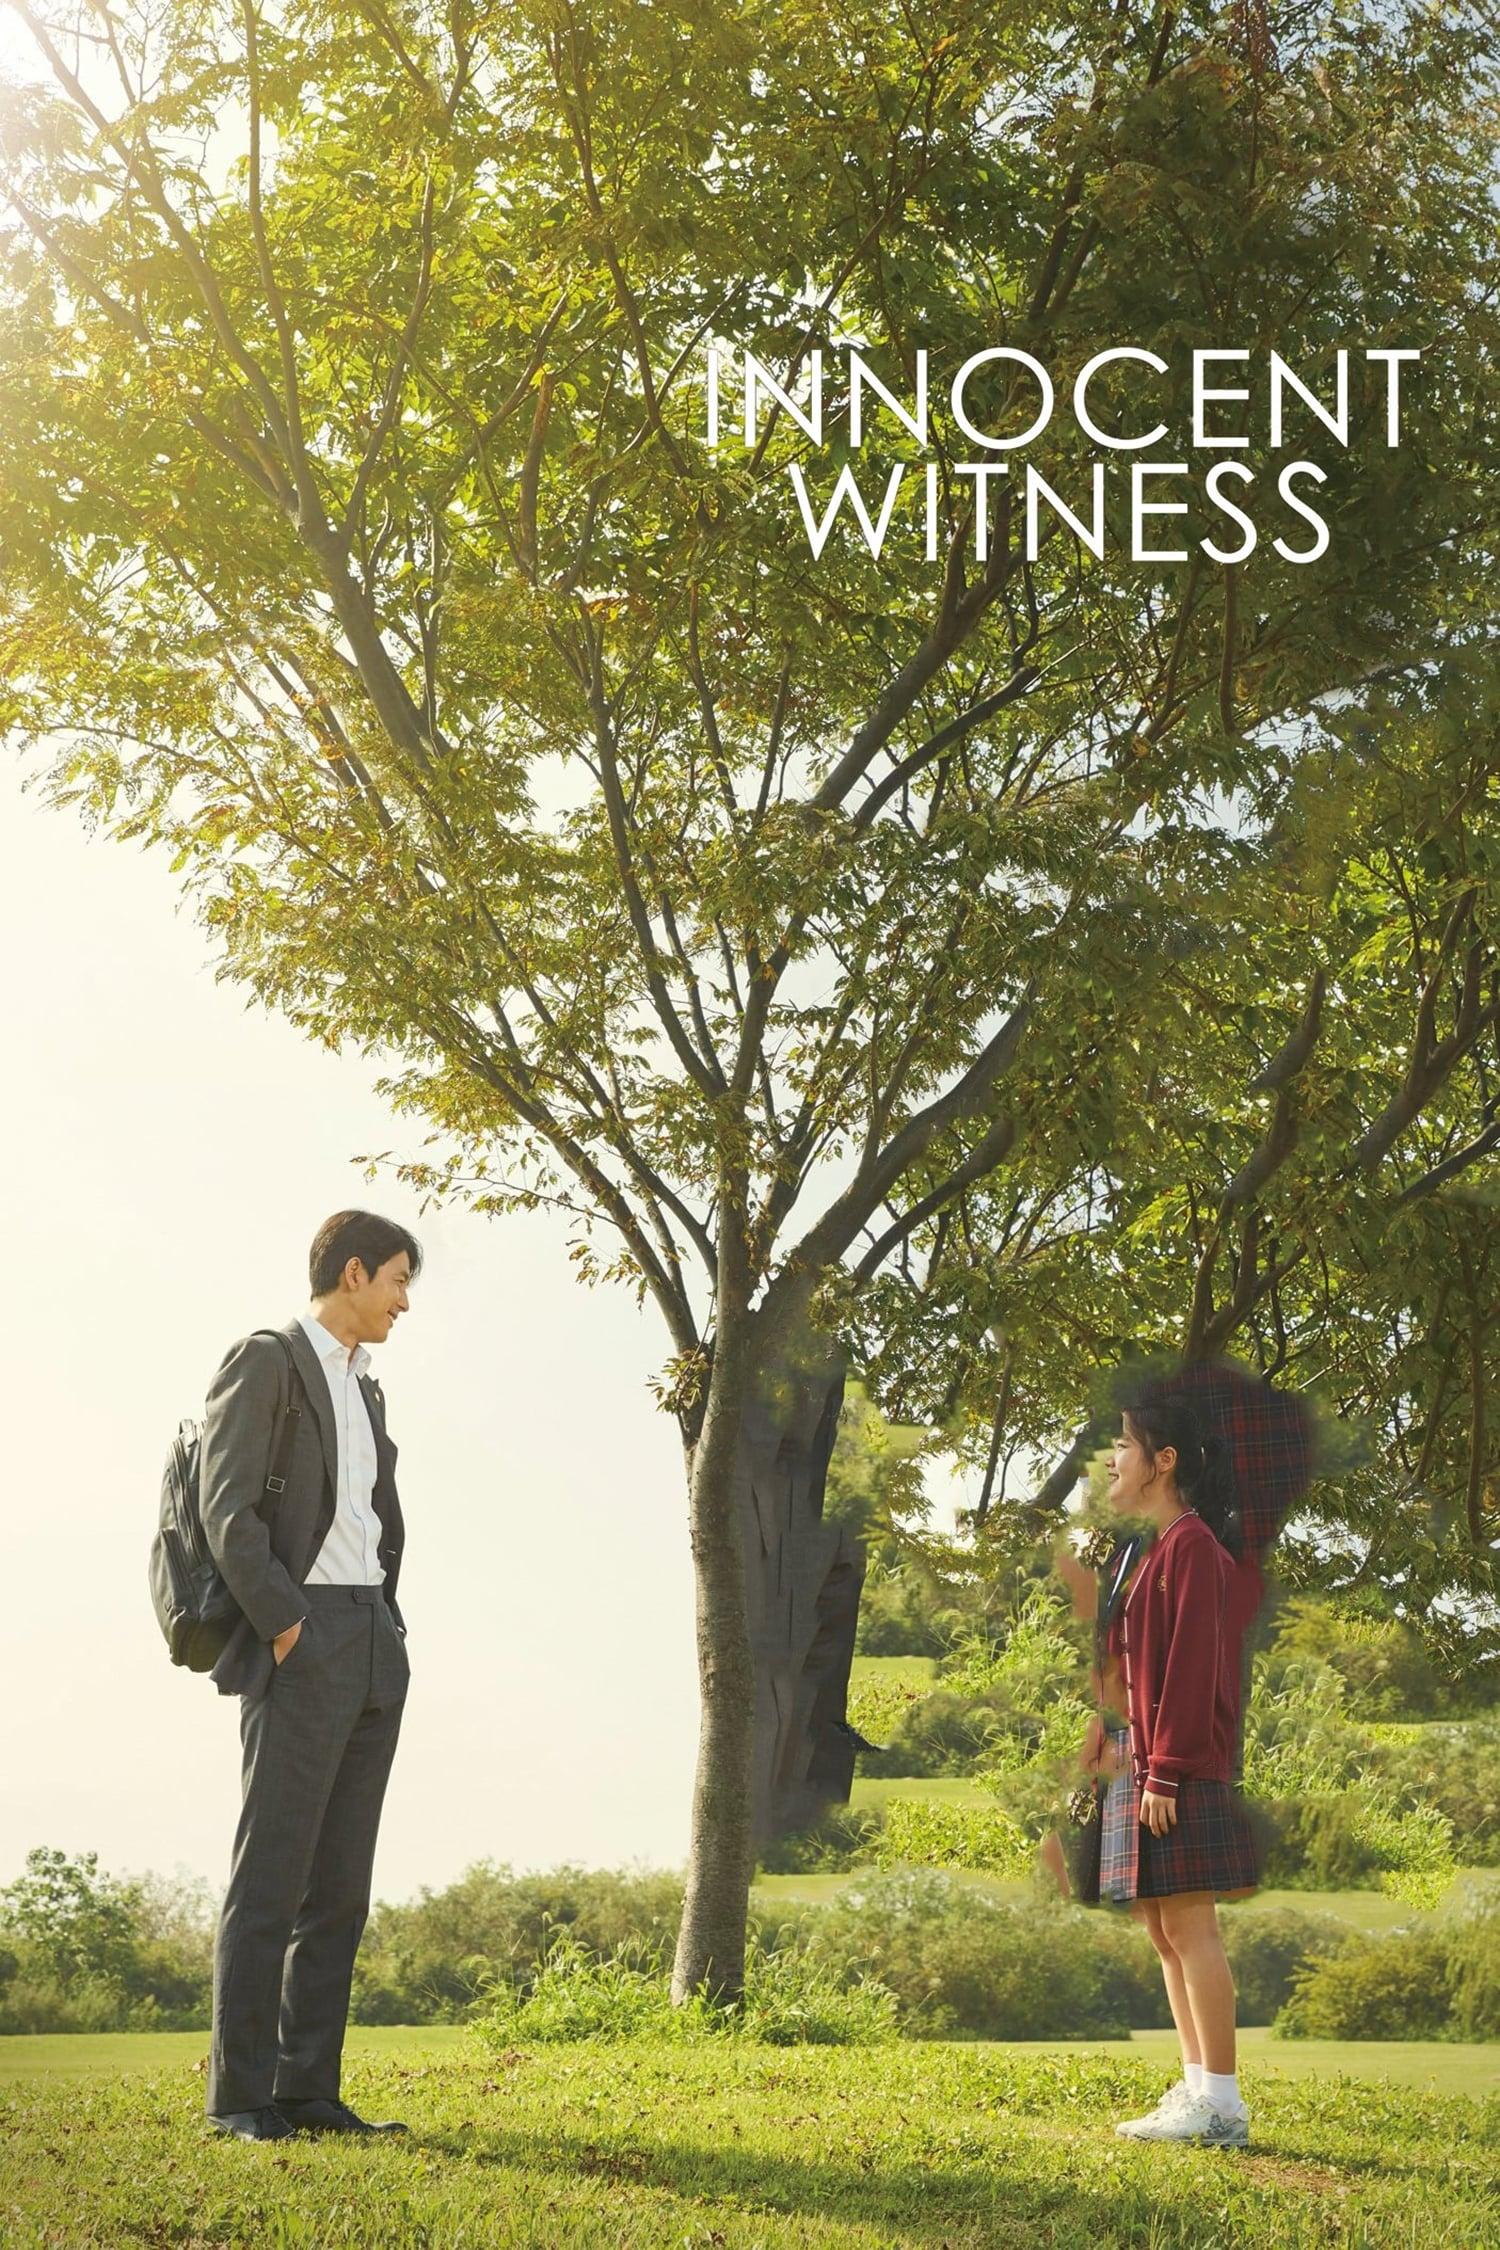 Innocent witness - Films sur Jambo Congo